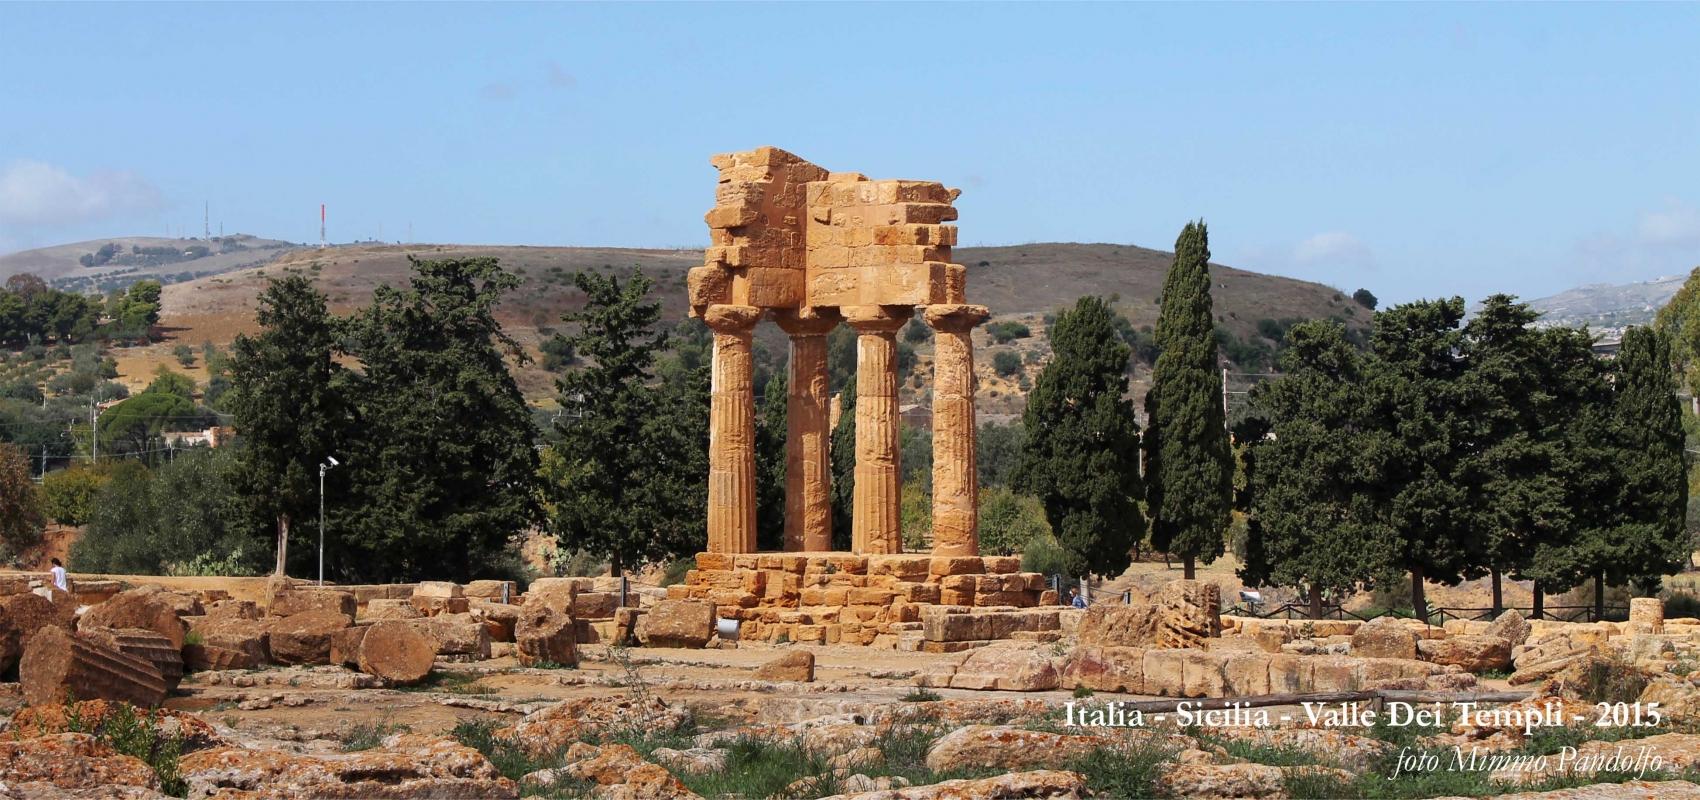 Sicilia, Agrigento - Valle dei Templi - 2015